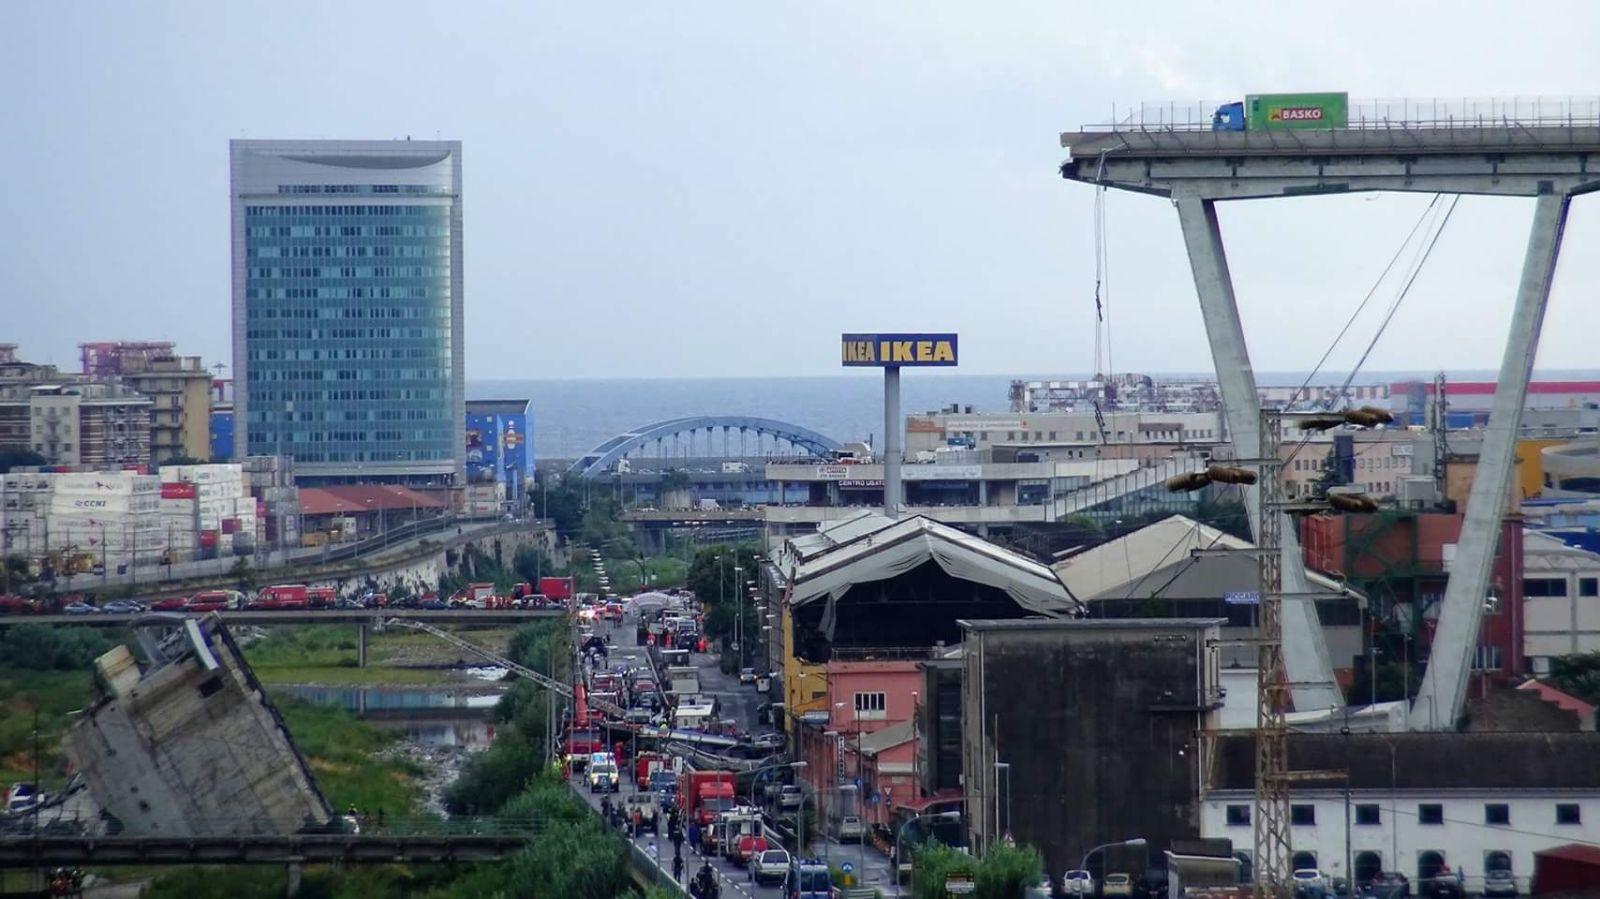 Ponte Morandi Crollato, Viadotto Morandi di Genova, la foto del camion rimasto sul ponte